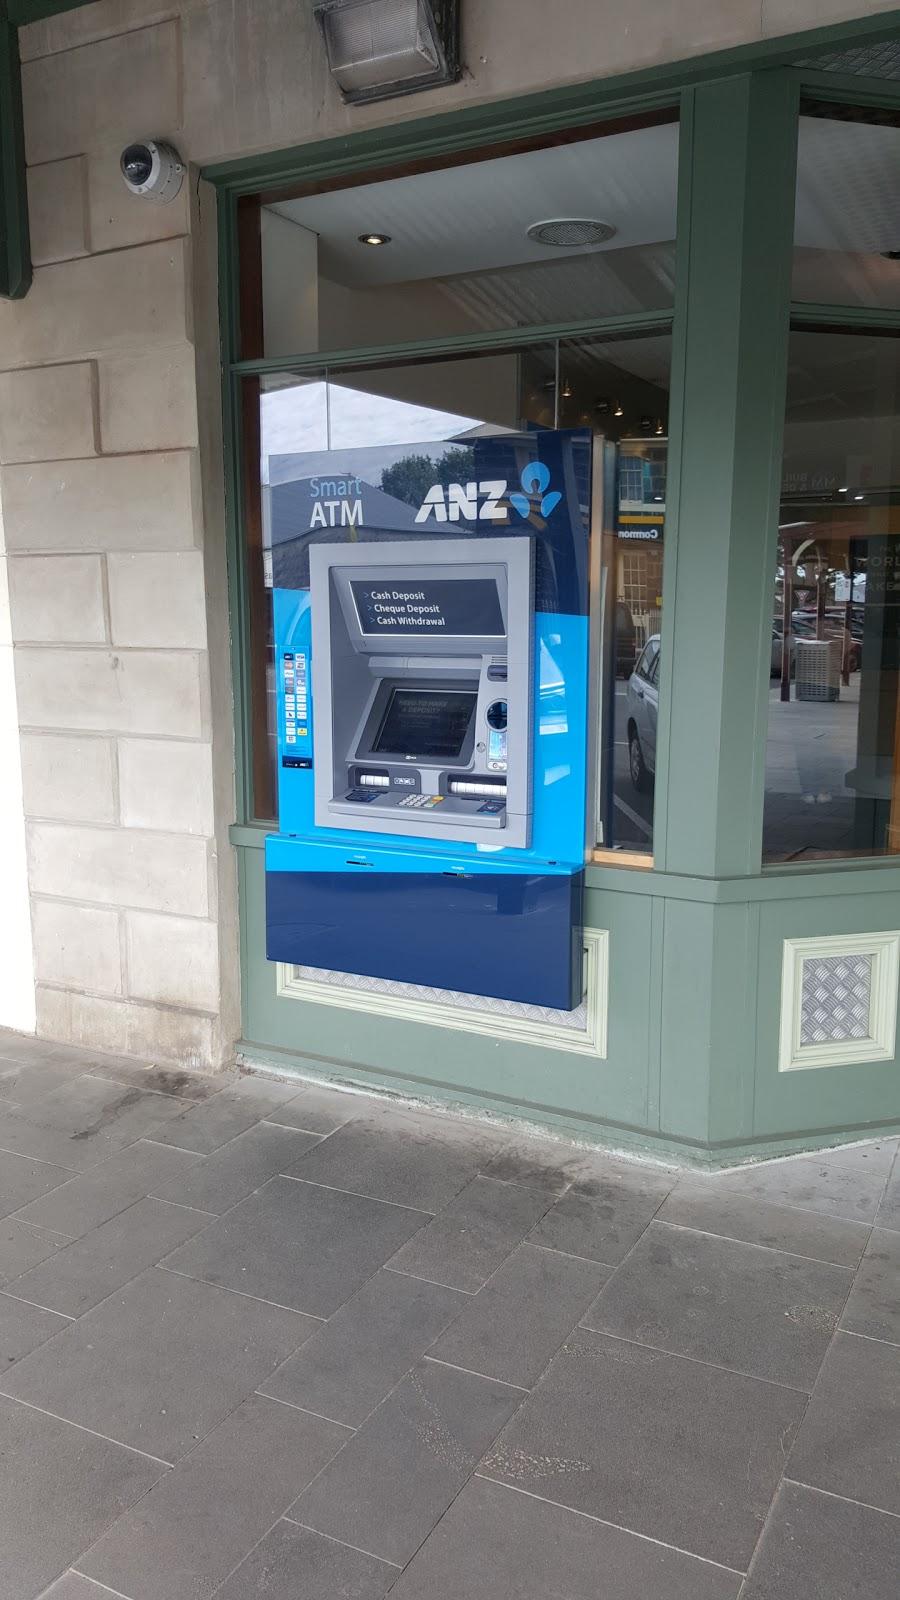 ANZ ATM Port Fairy (Smart) | atm | 54 Sackville St, Port Fairy VIC 3284, Australia | 131314 OR +61 131314